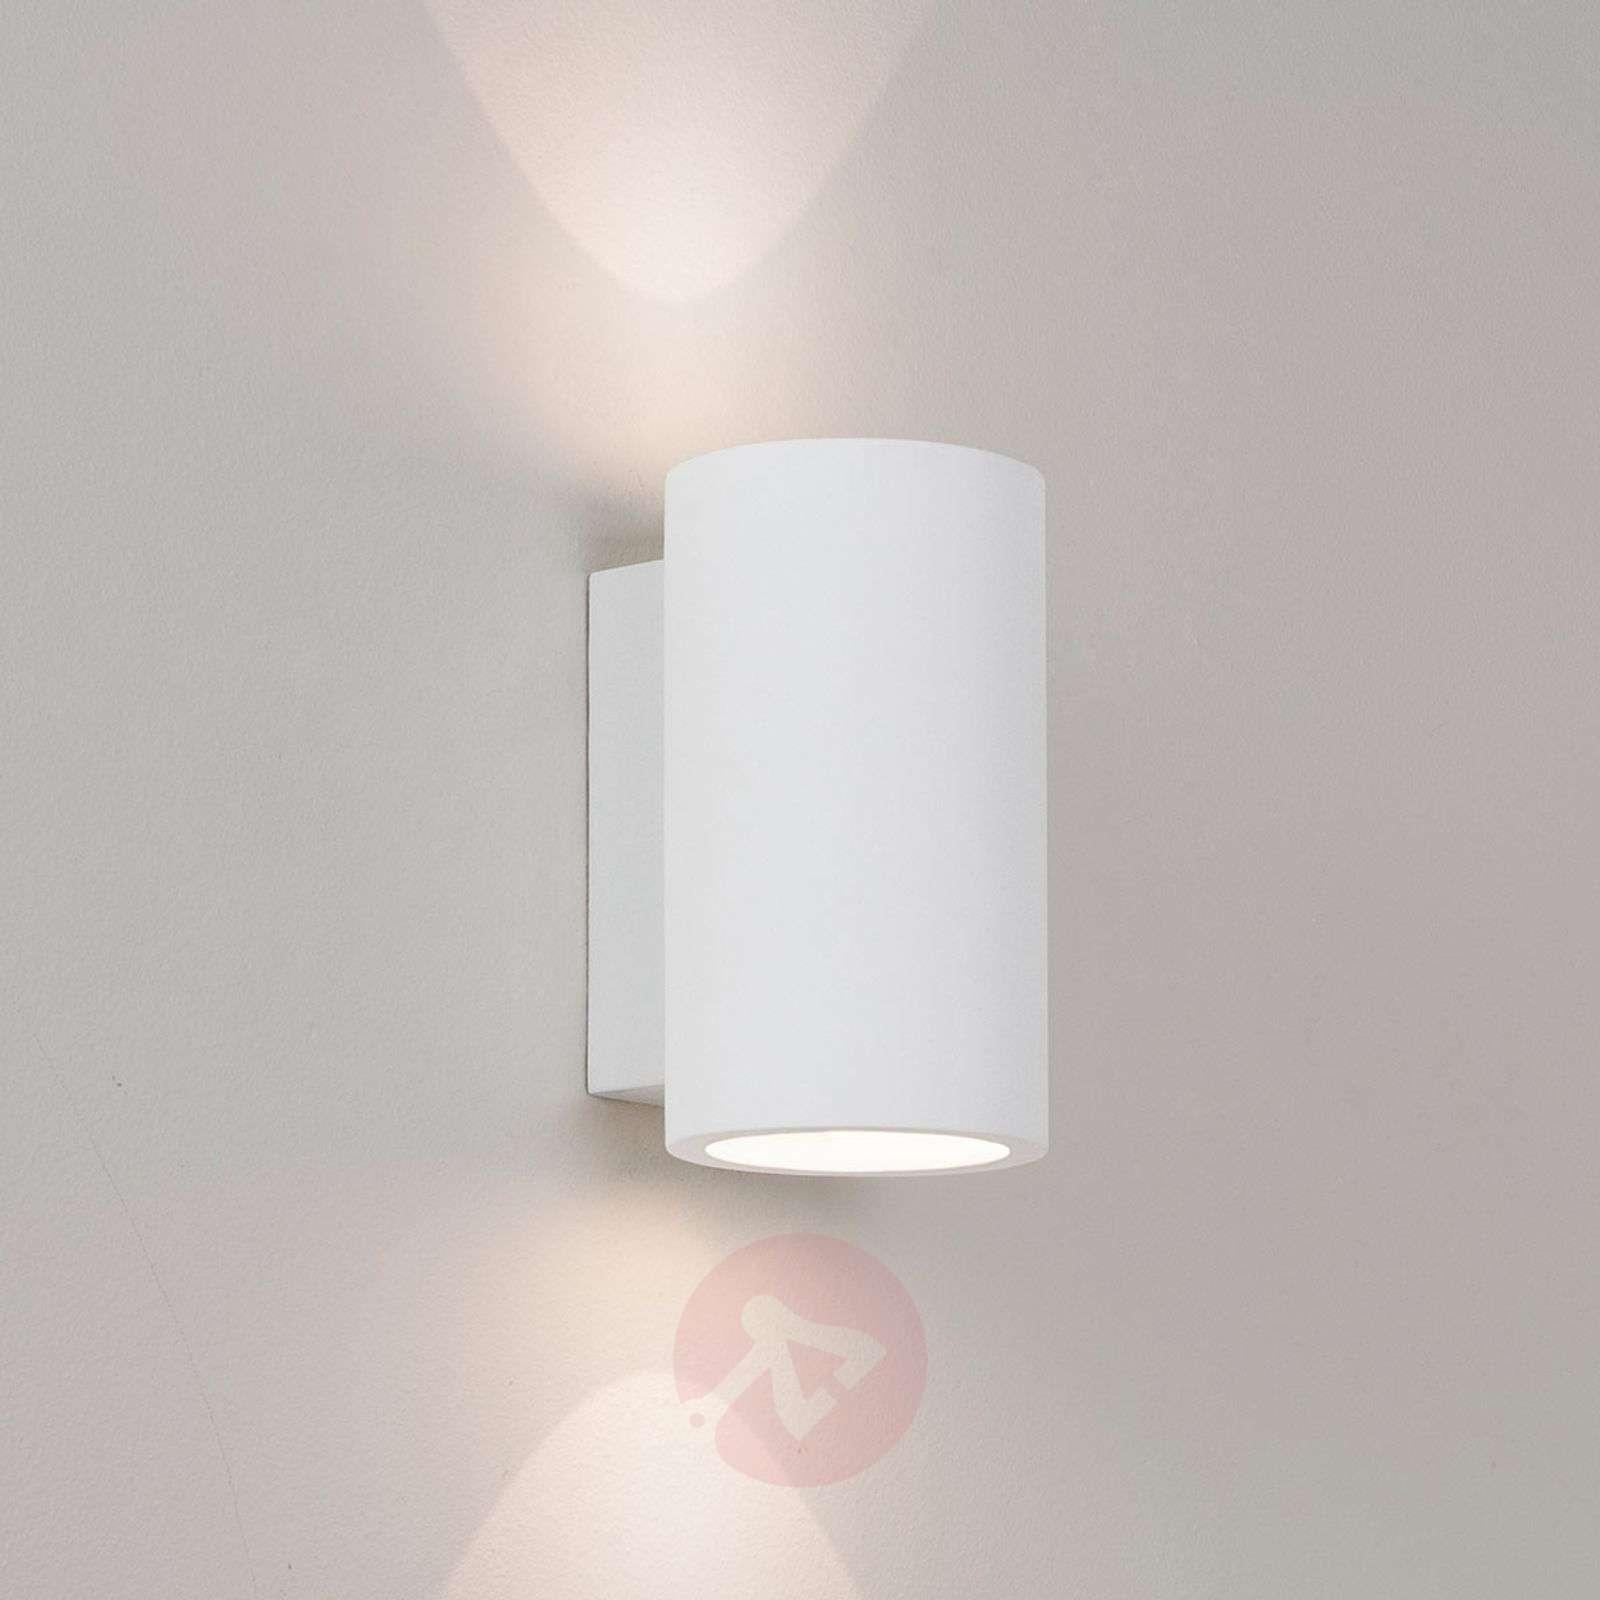 Bologna 160 LED Wall Light White-1020397-02